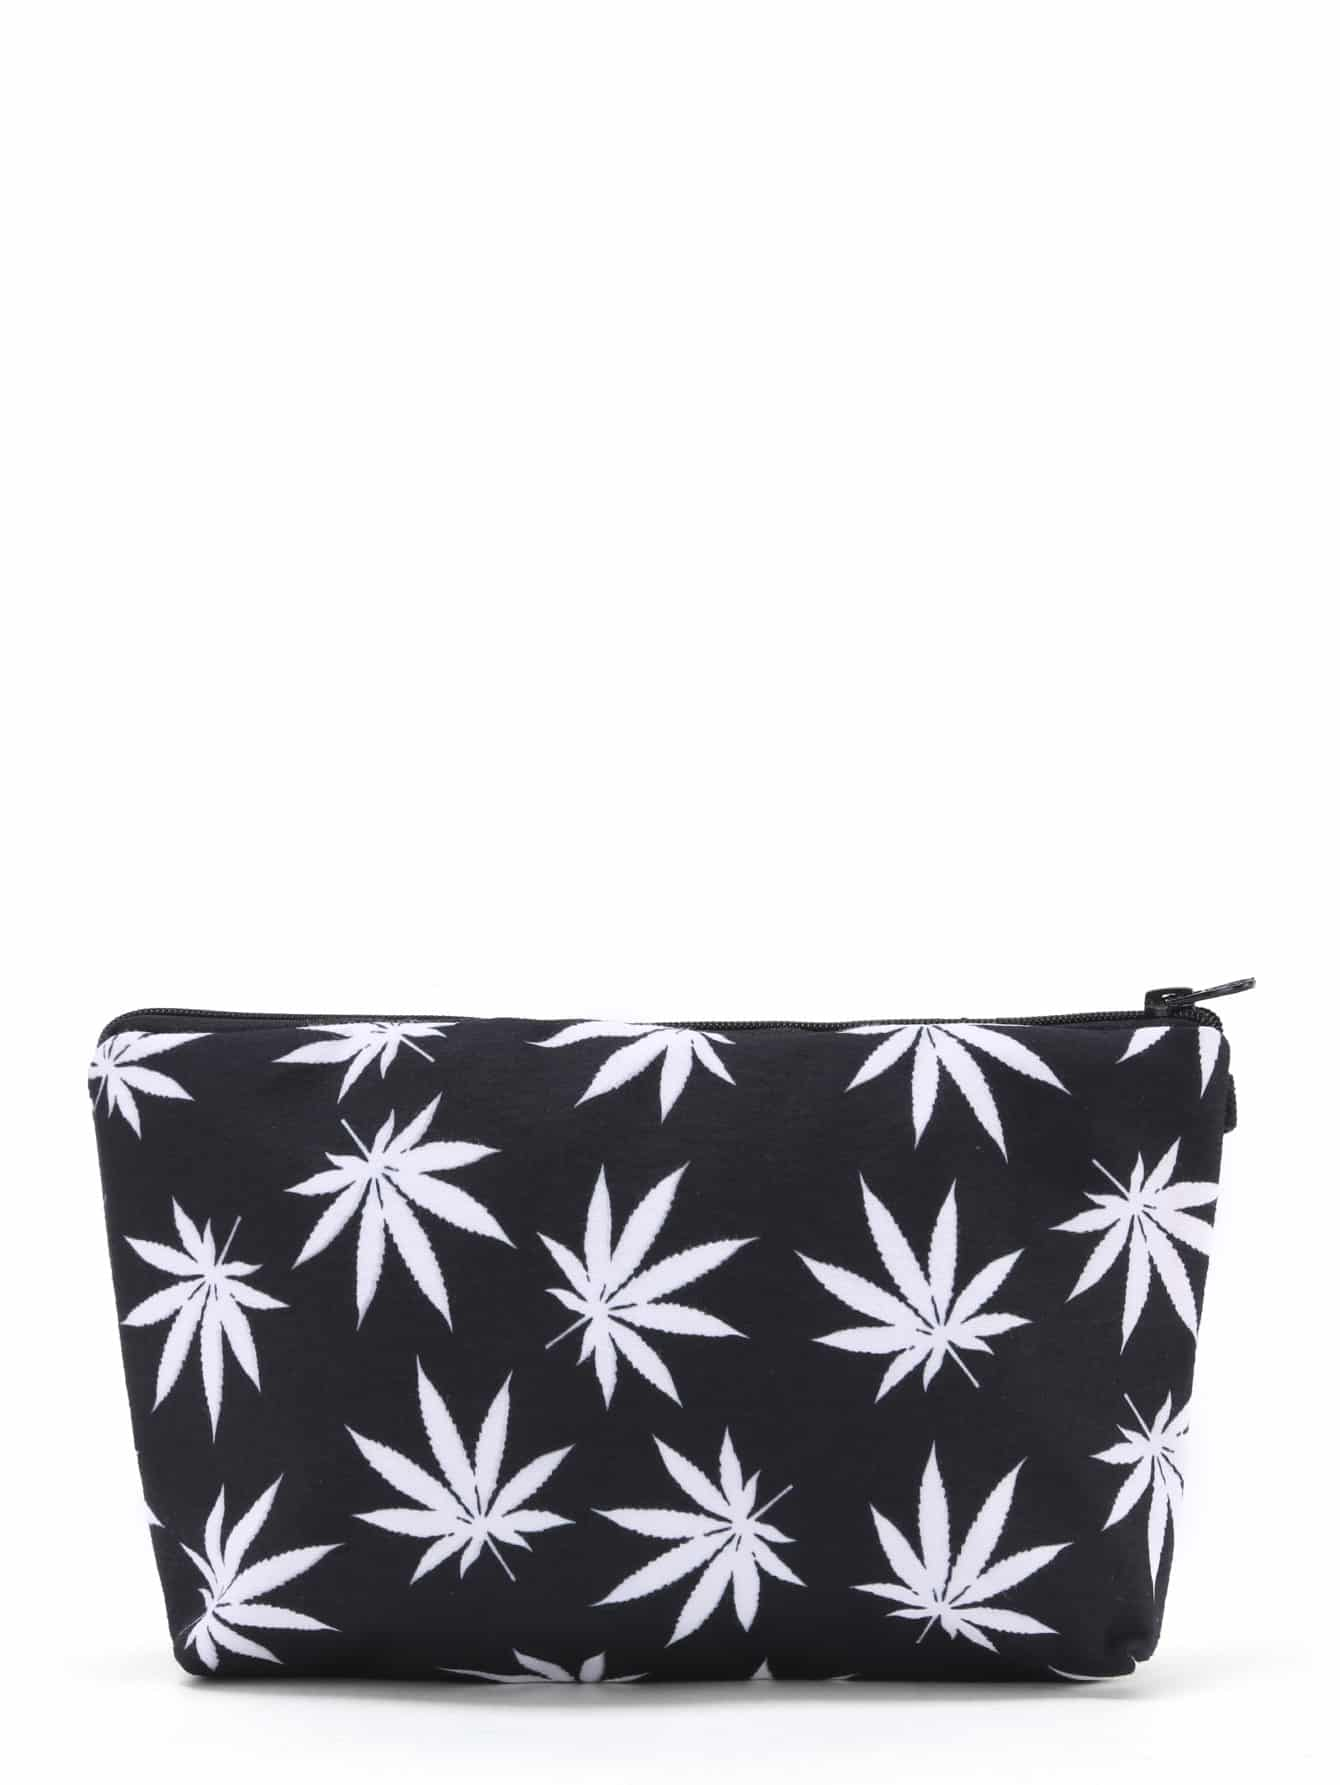 Maple Leaf Print Zipper Pouch юбка fz1850 maple leaf 2014